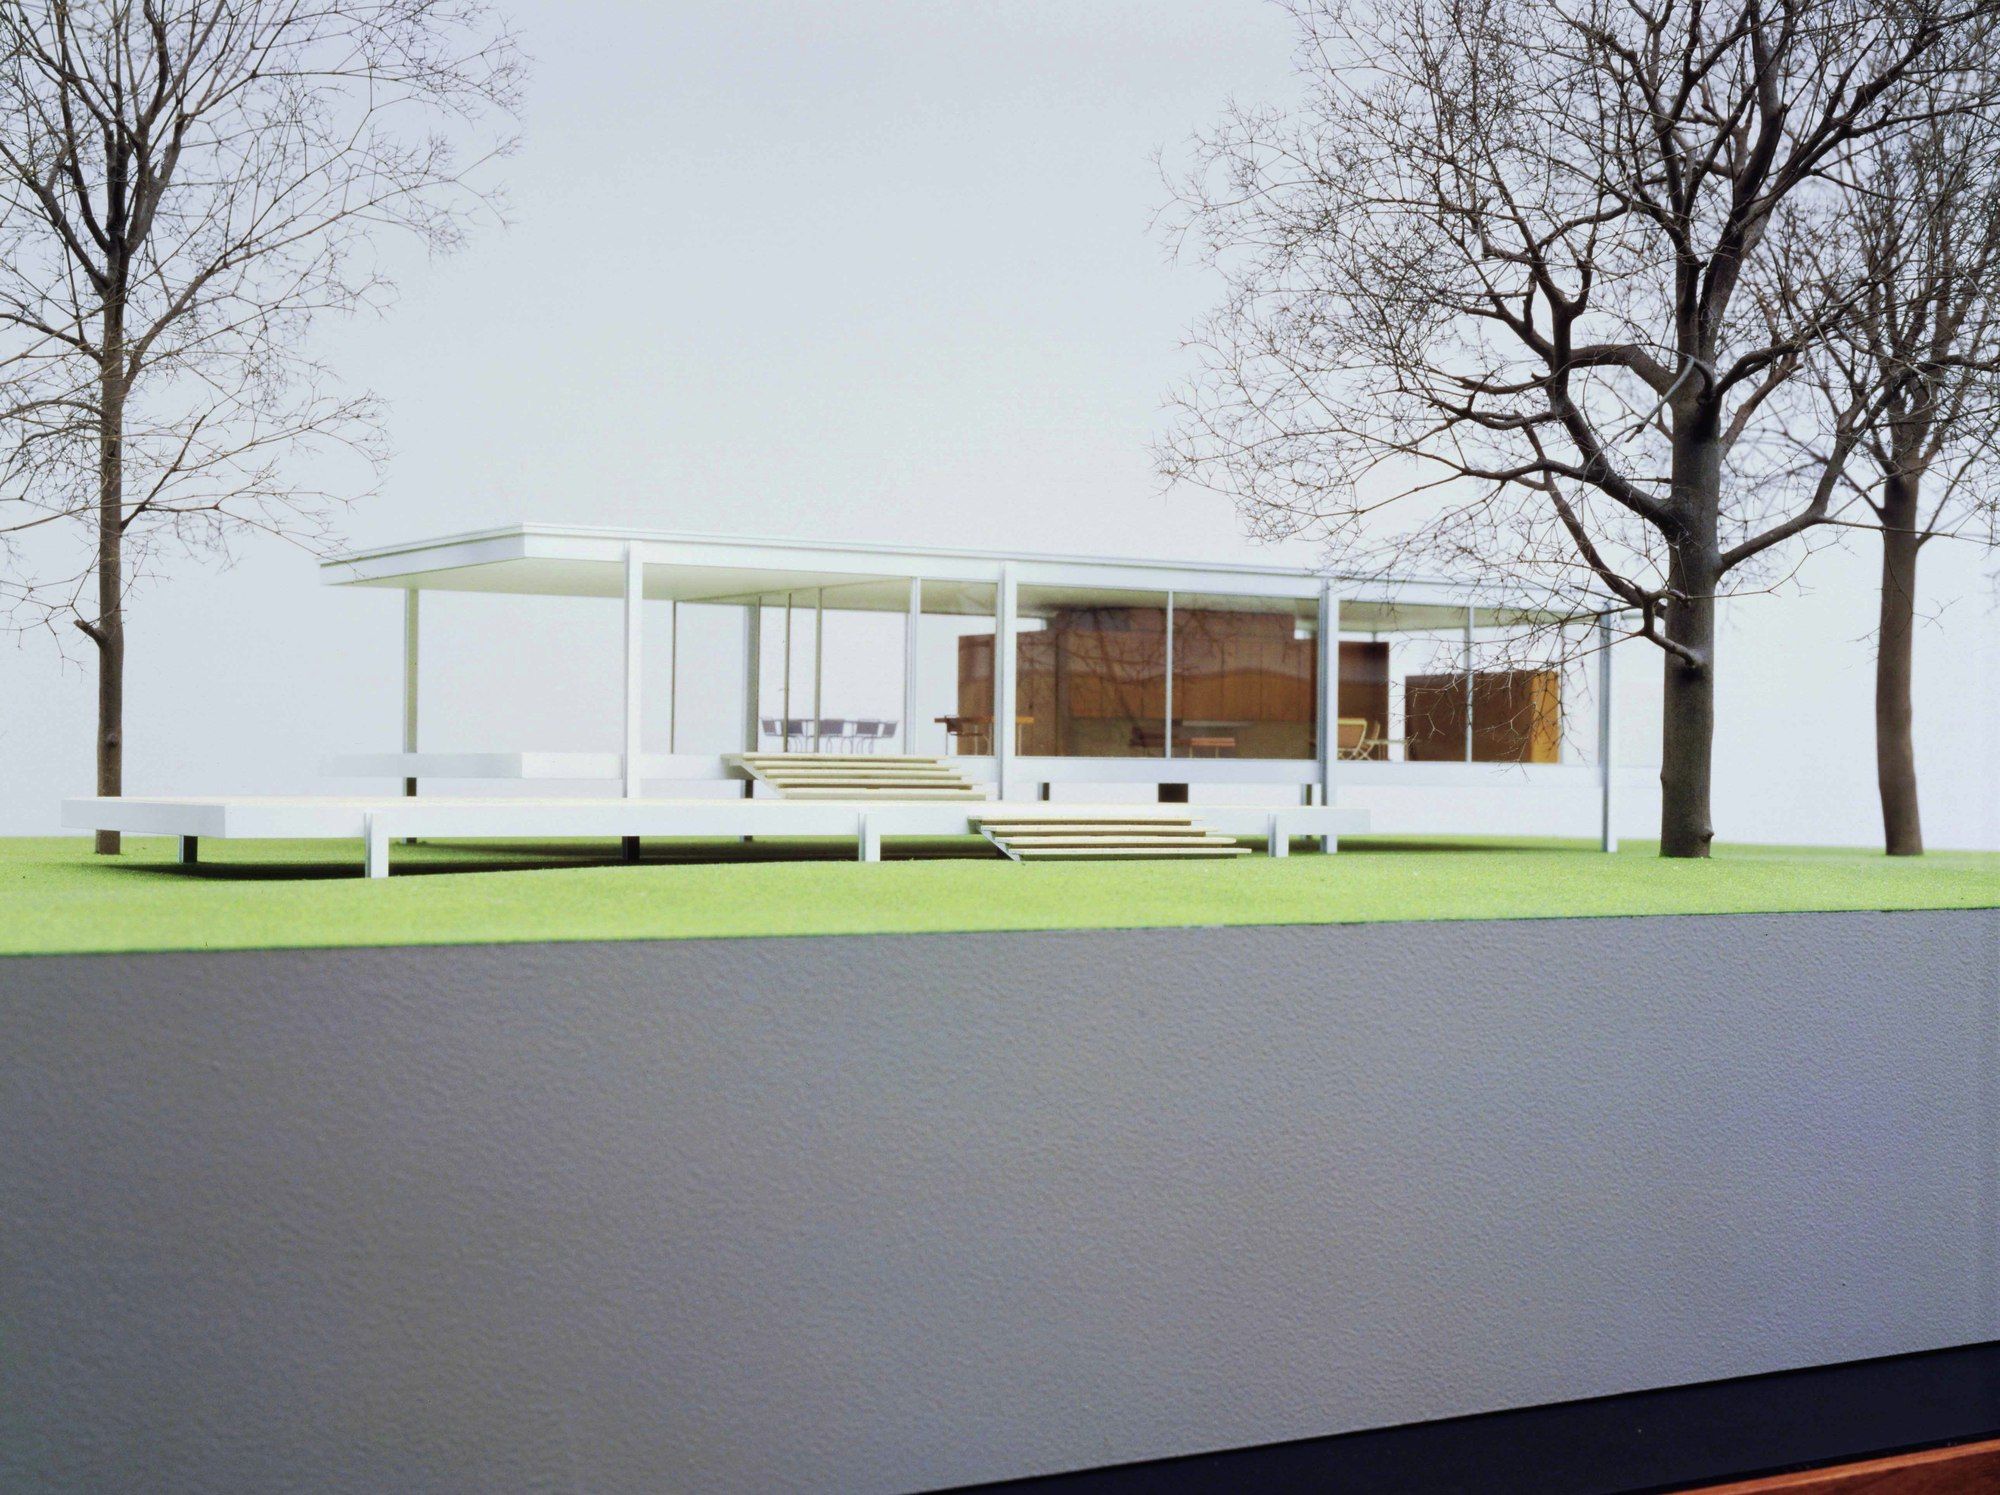 Delightful Model Of Mies Van Der Roheu0027s Farnsworth House, Plano, Illinois (1945u201351